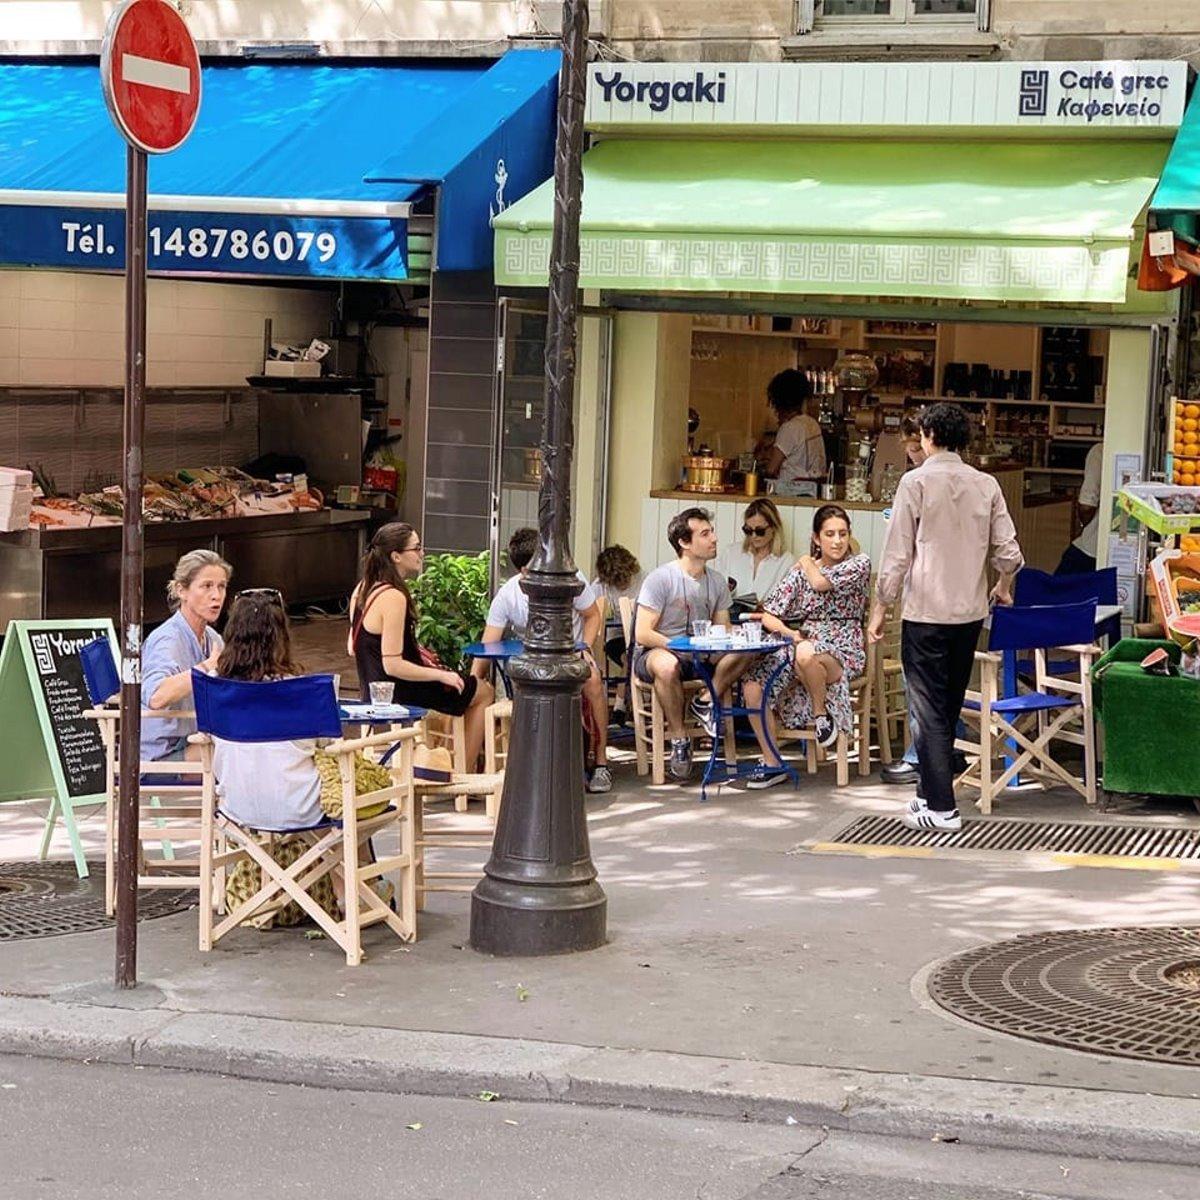 Yorgaki καφέ στο παρίσι παραδοσιακός καφές πελάτες σε τραπεζάκια